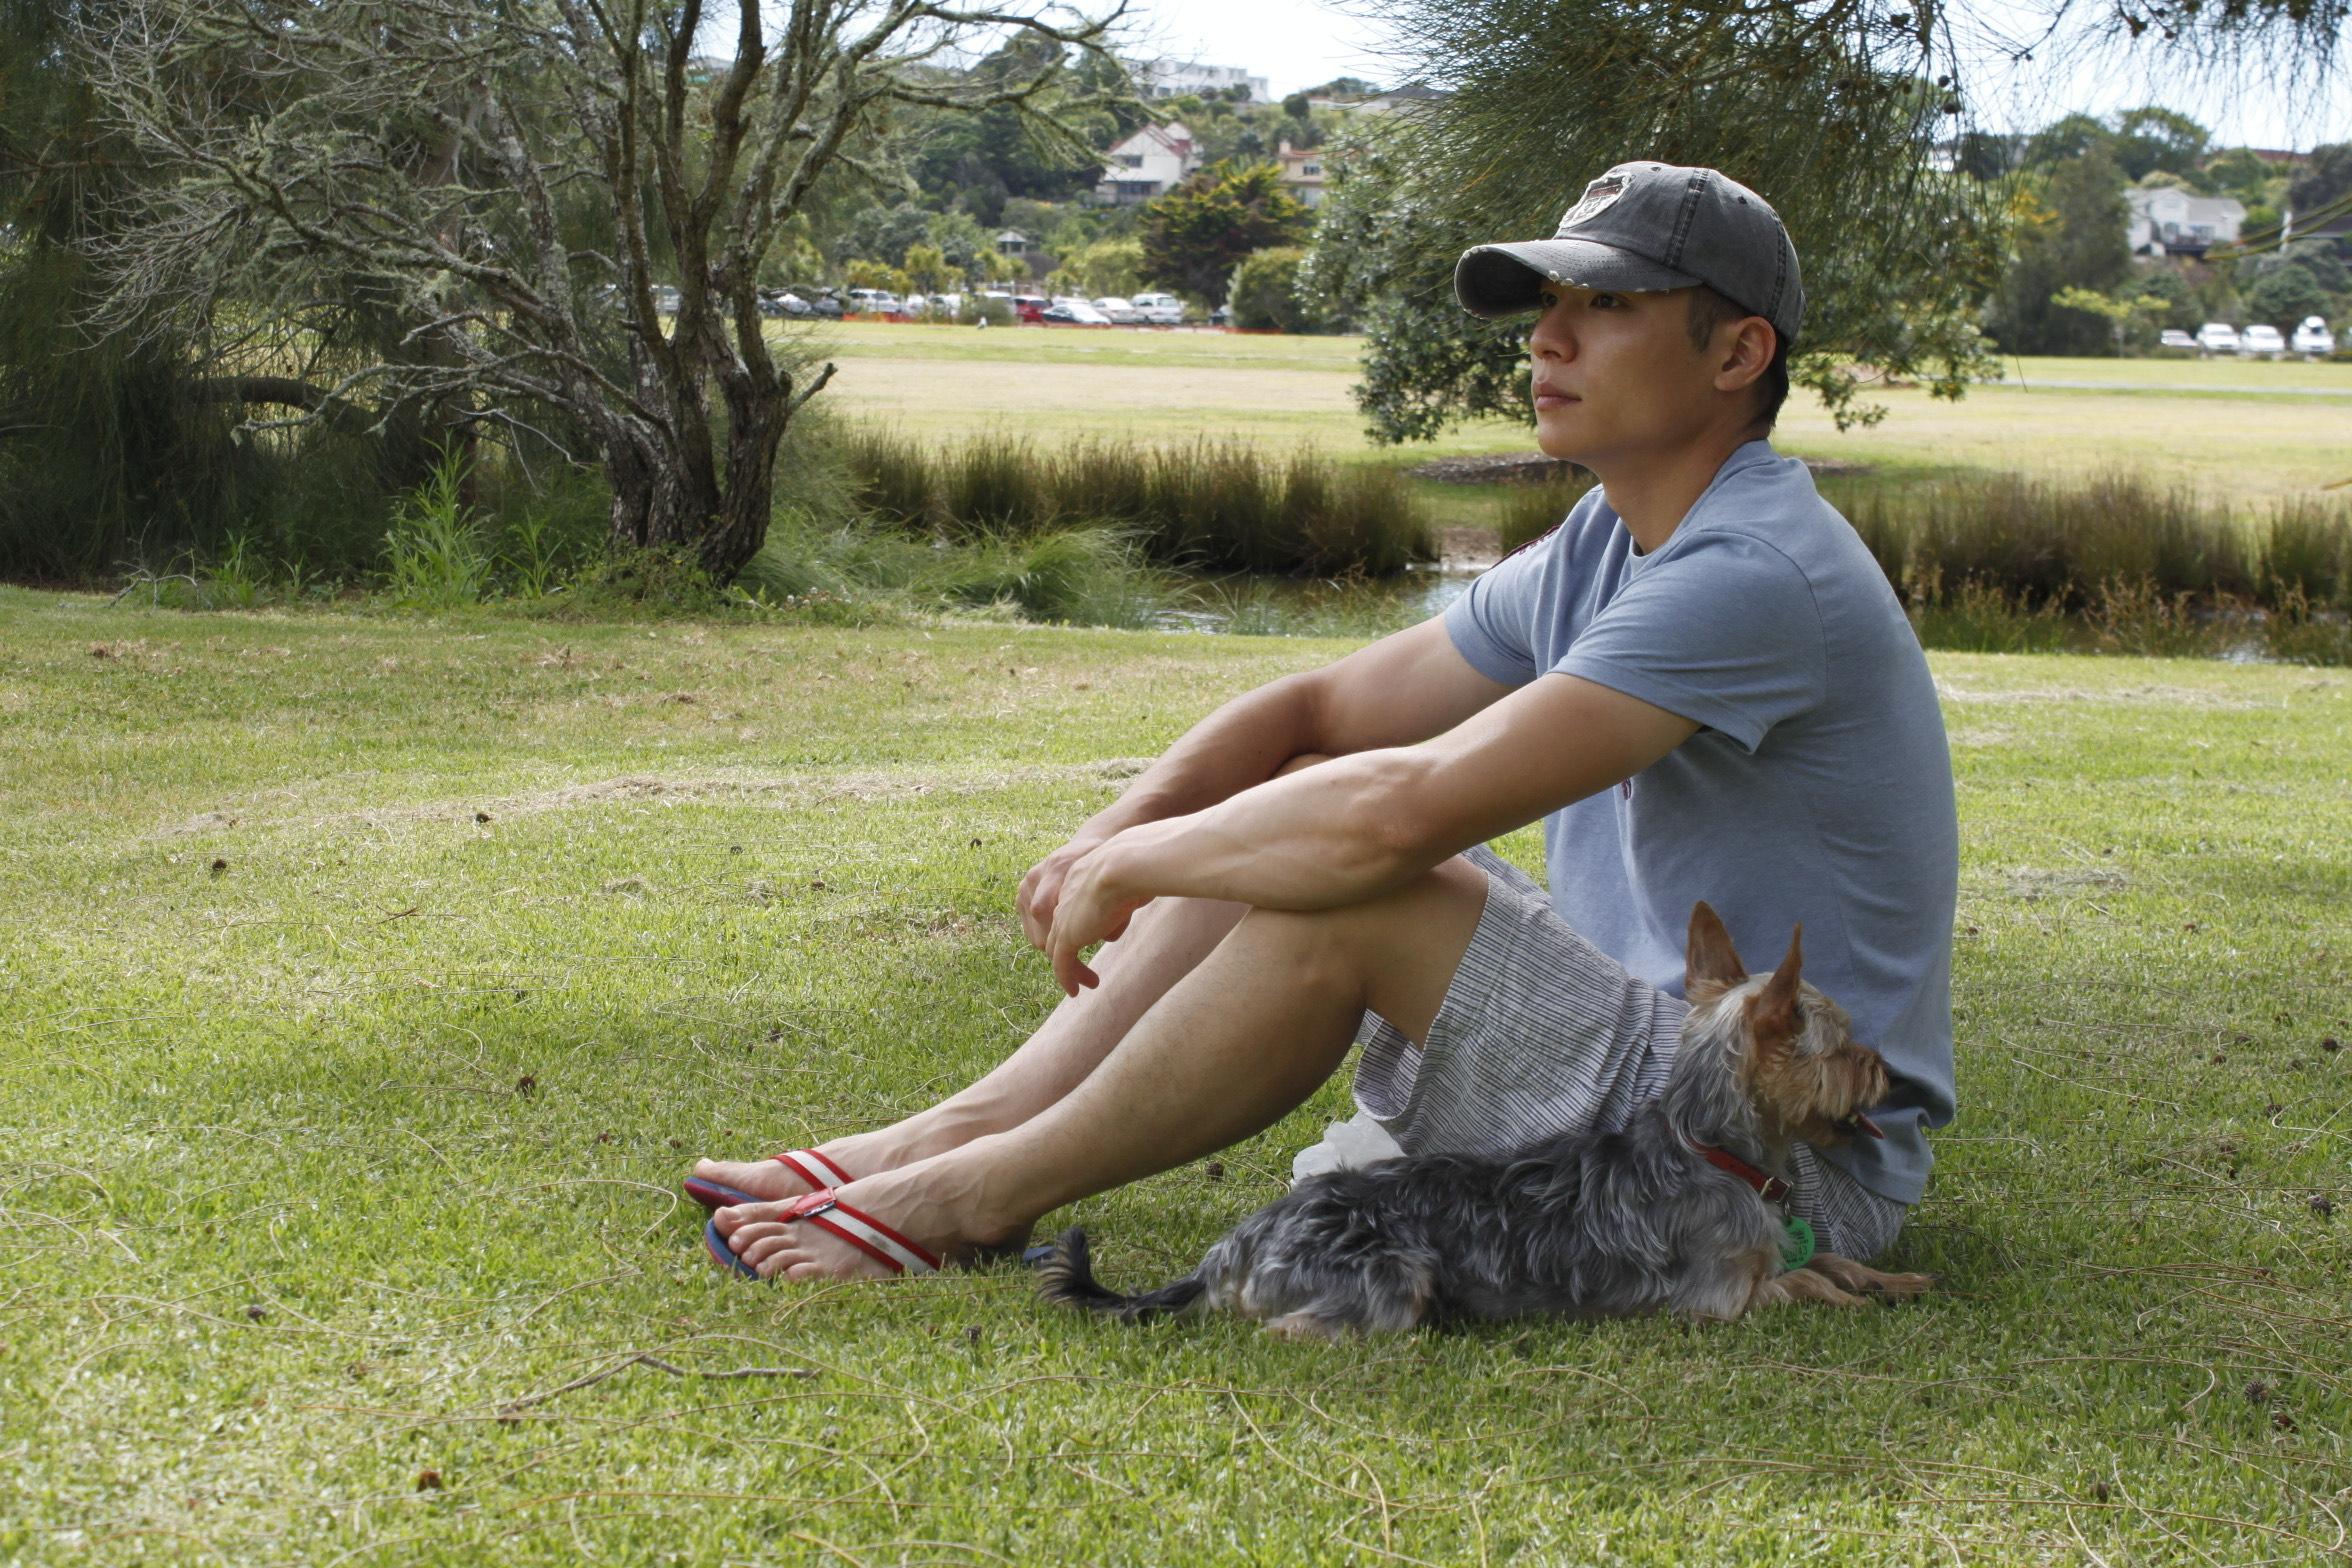 Jung Son – Auckland, New Zealand